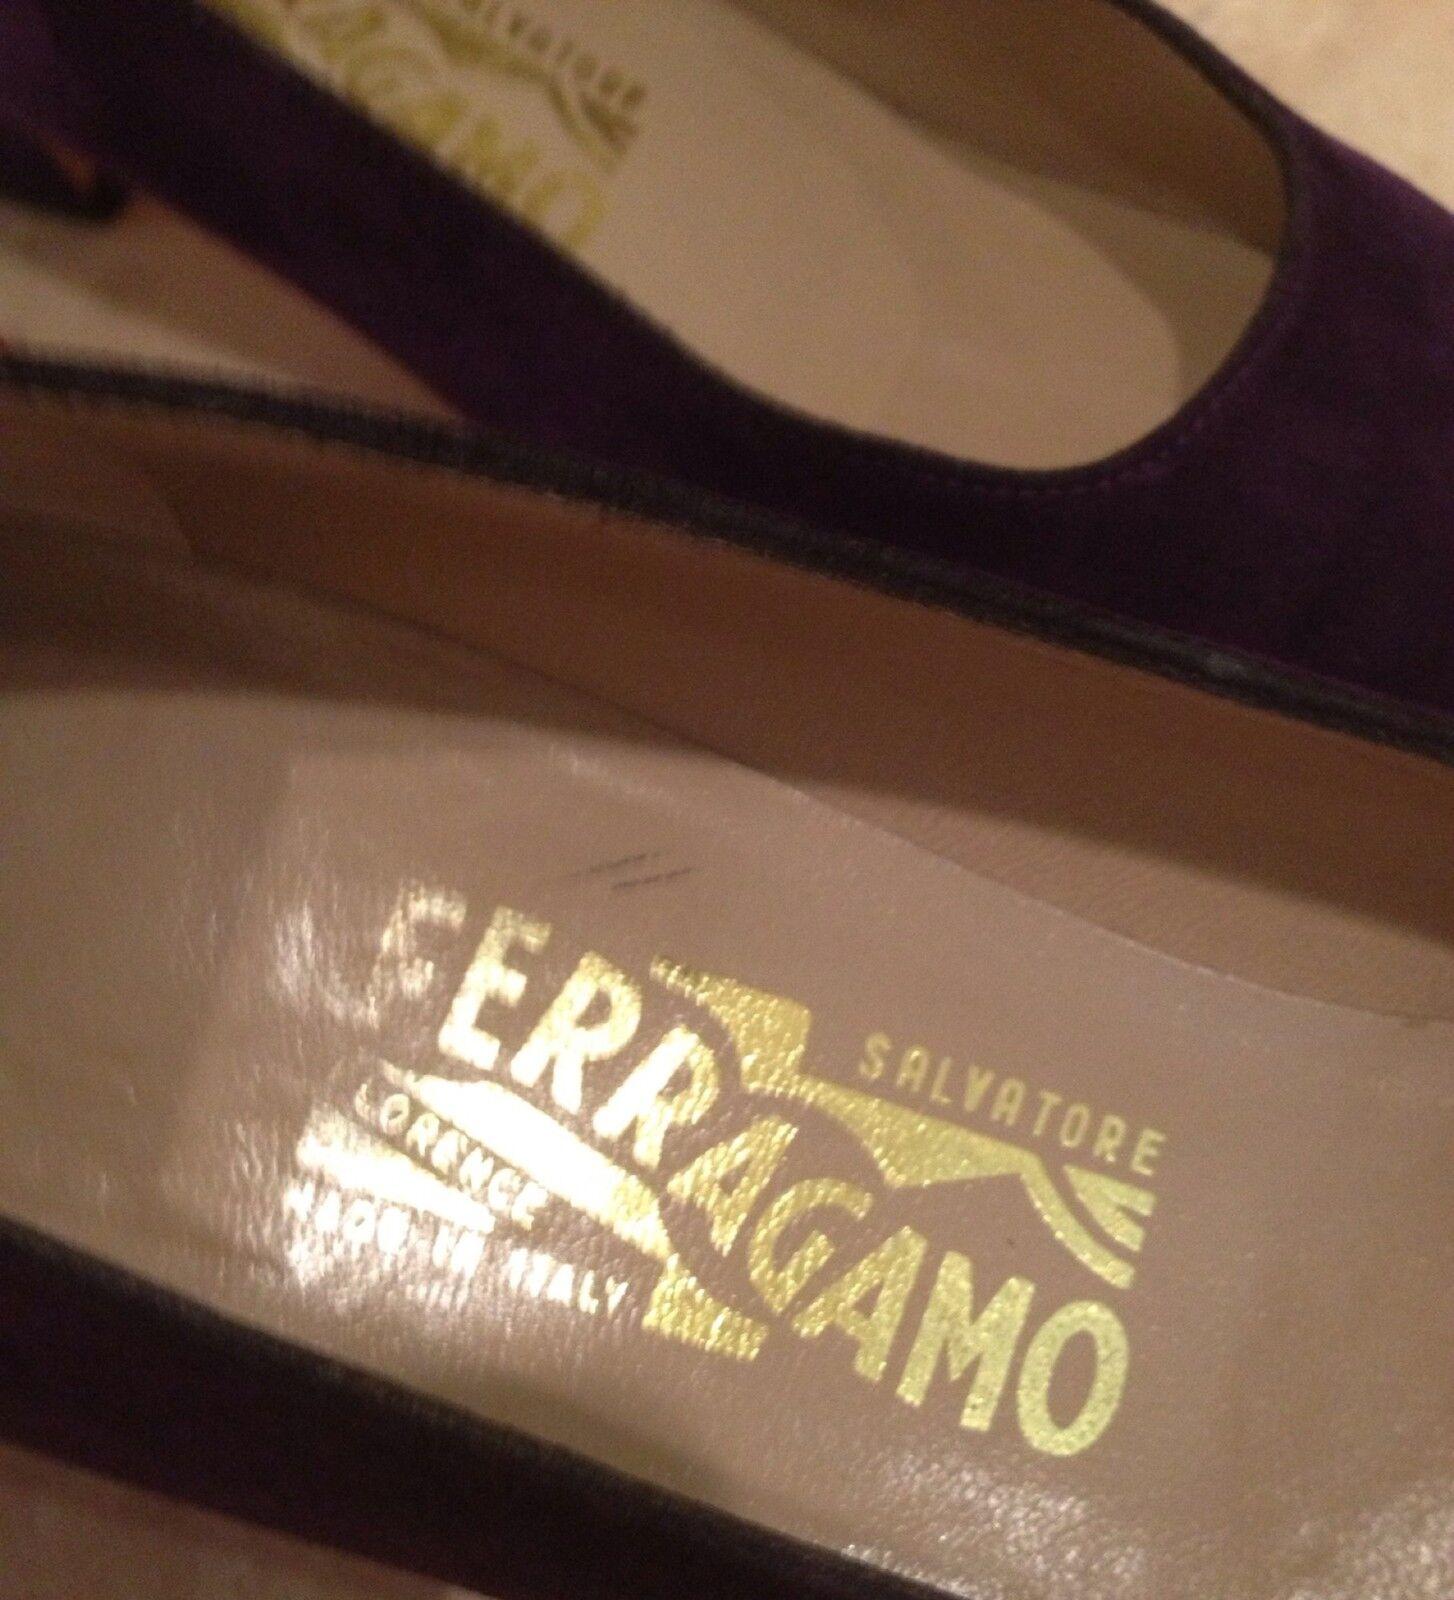 SALVATORE FERRAGAMO Rare PLUM PURPLE Suede Sz Classic Niedrig Heel Pump Sz Suede 8 4A f77d65